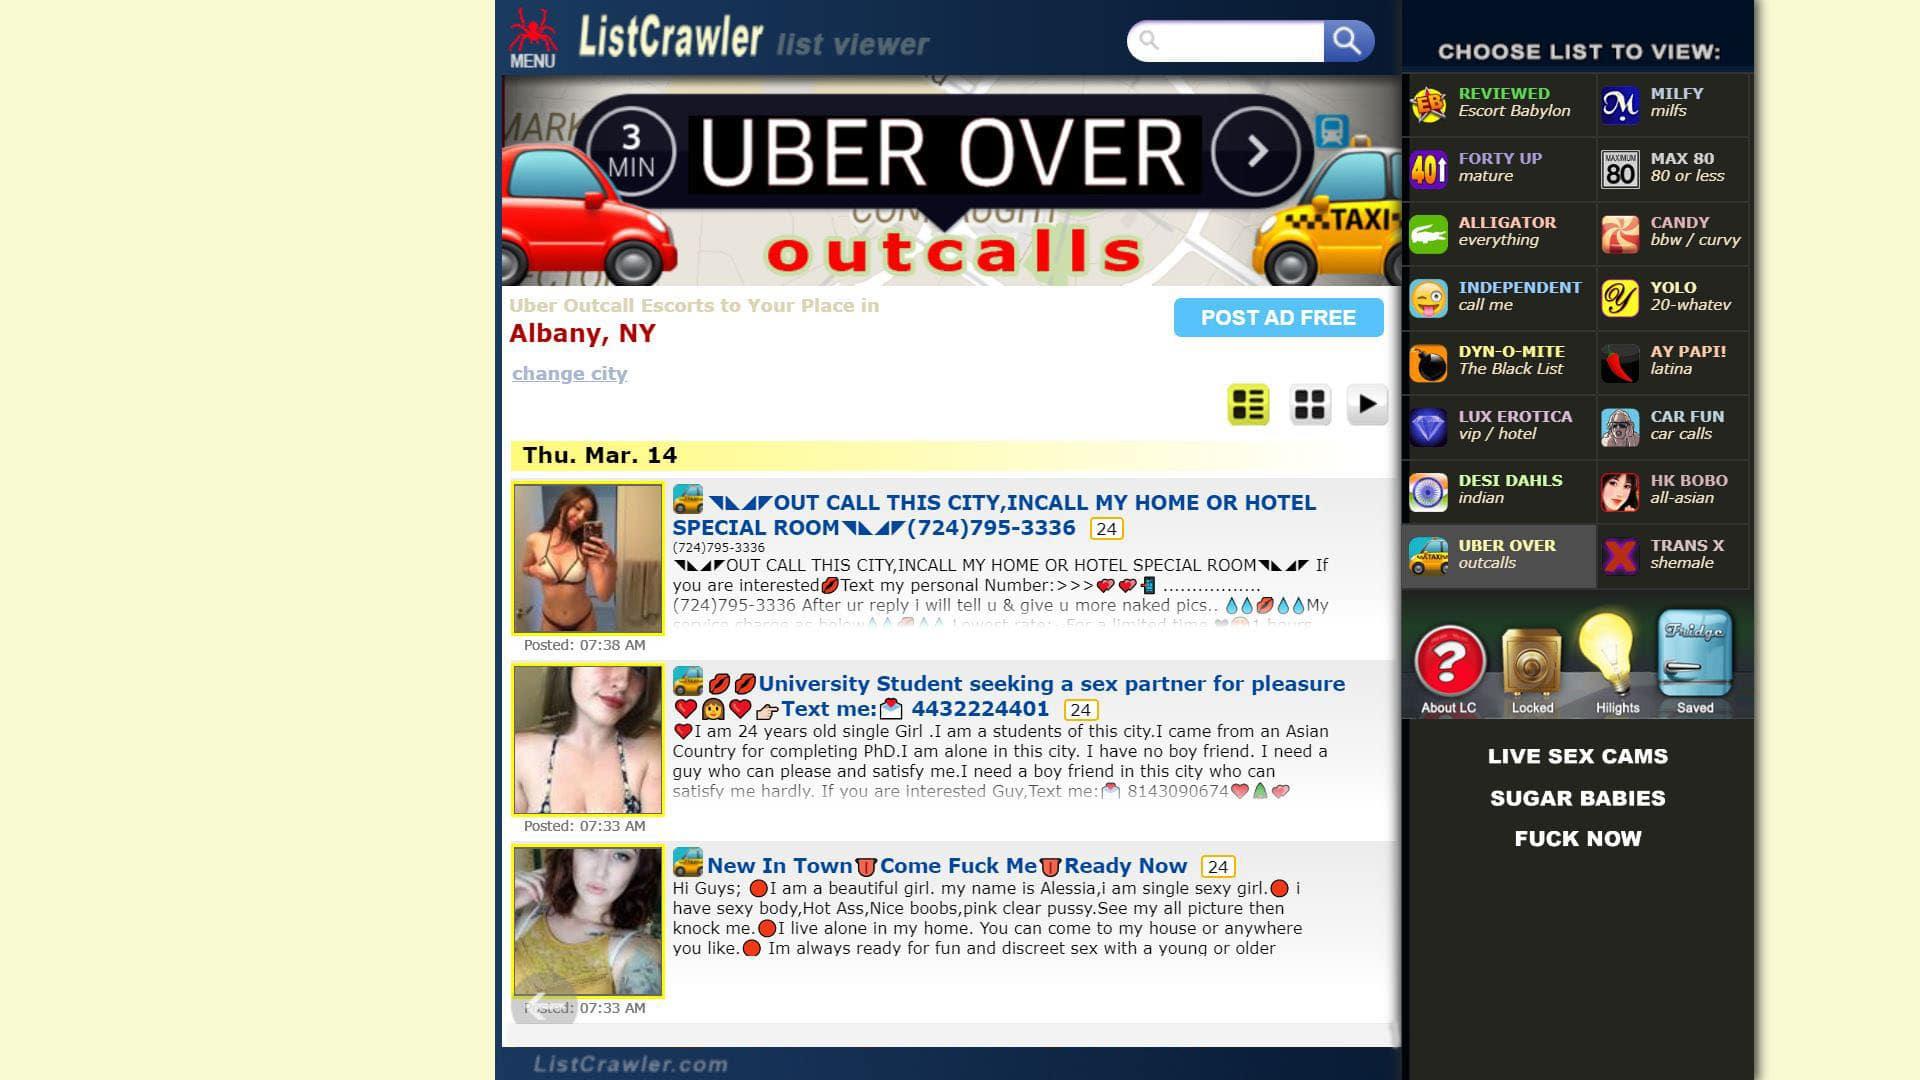 Listcrawler Uber Over